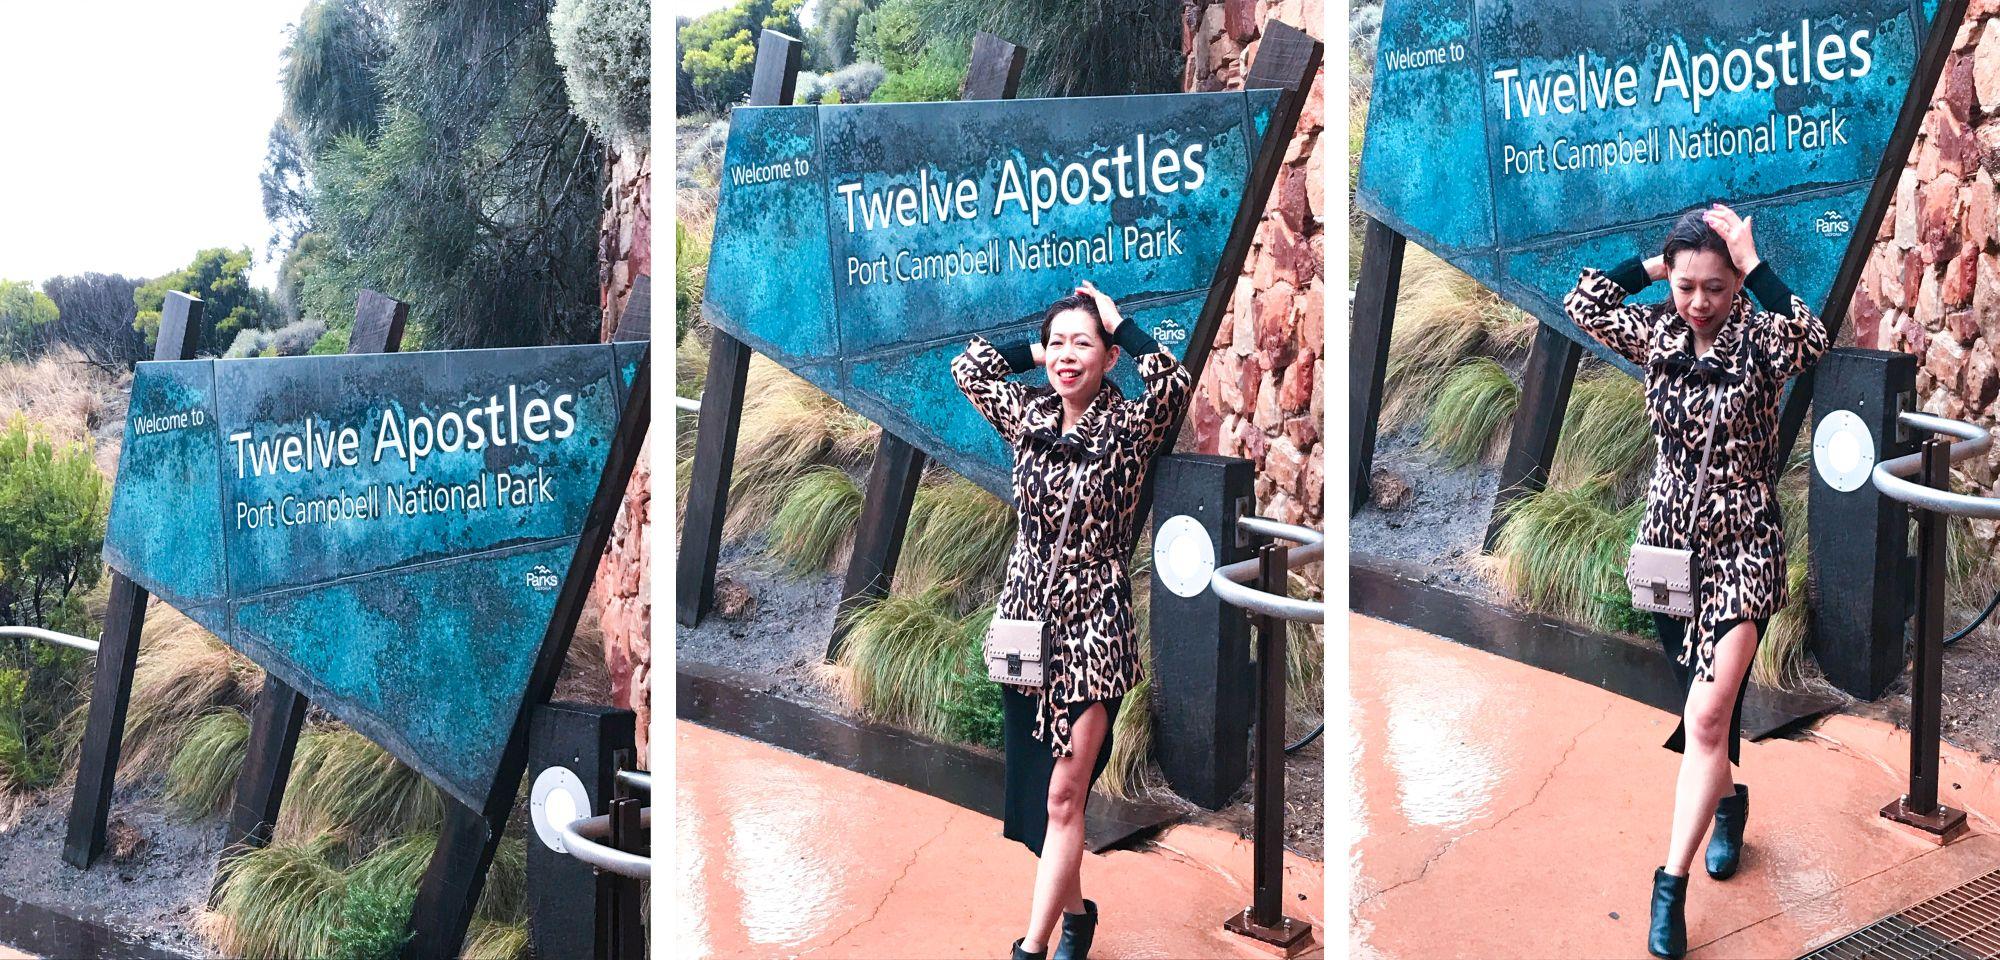 The Twelve Apostles story